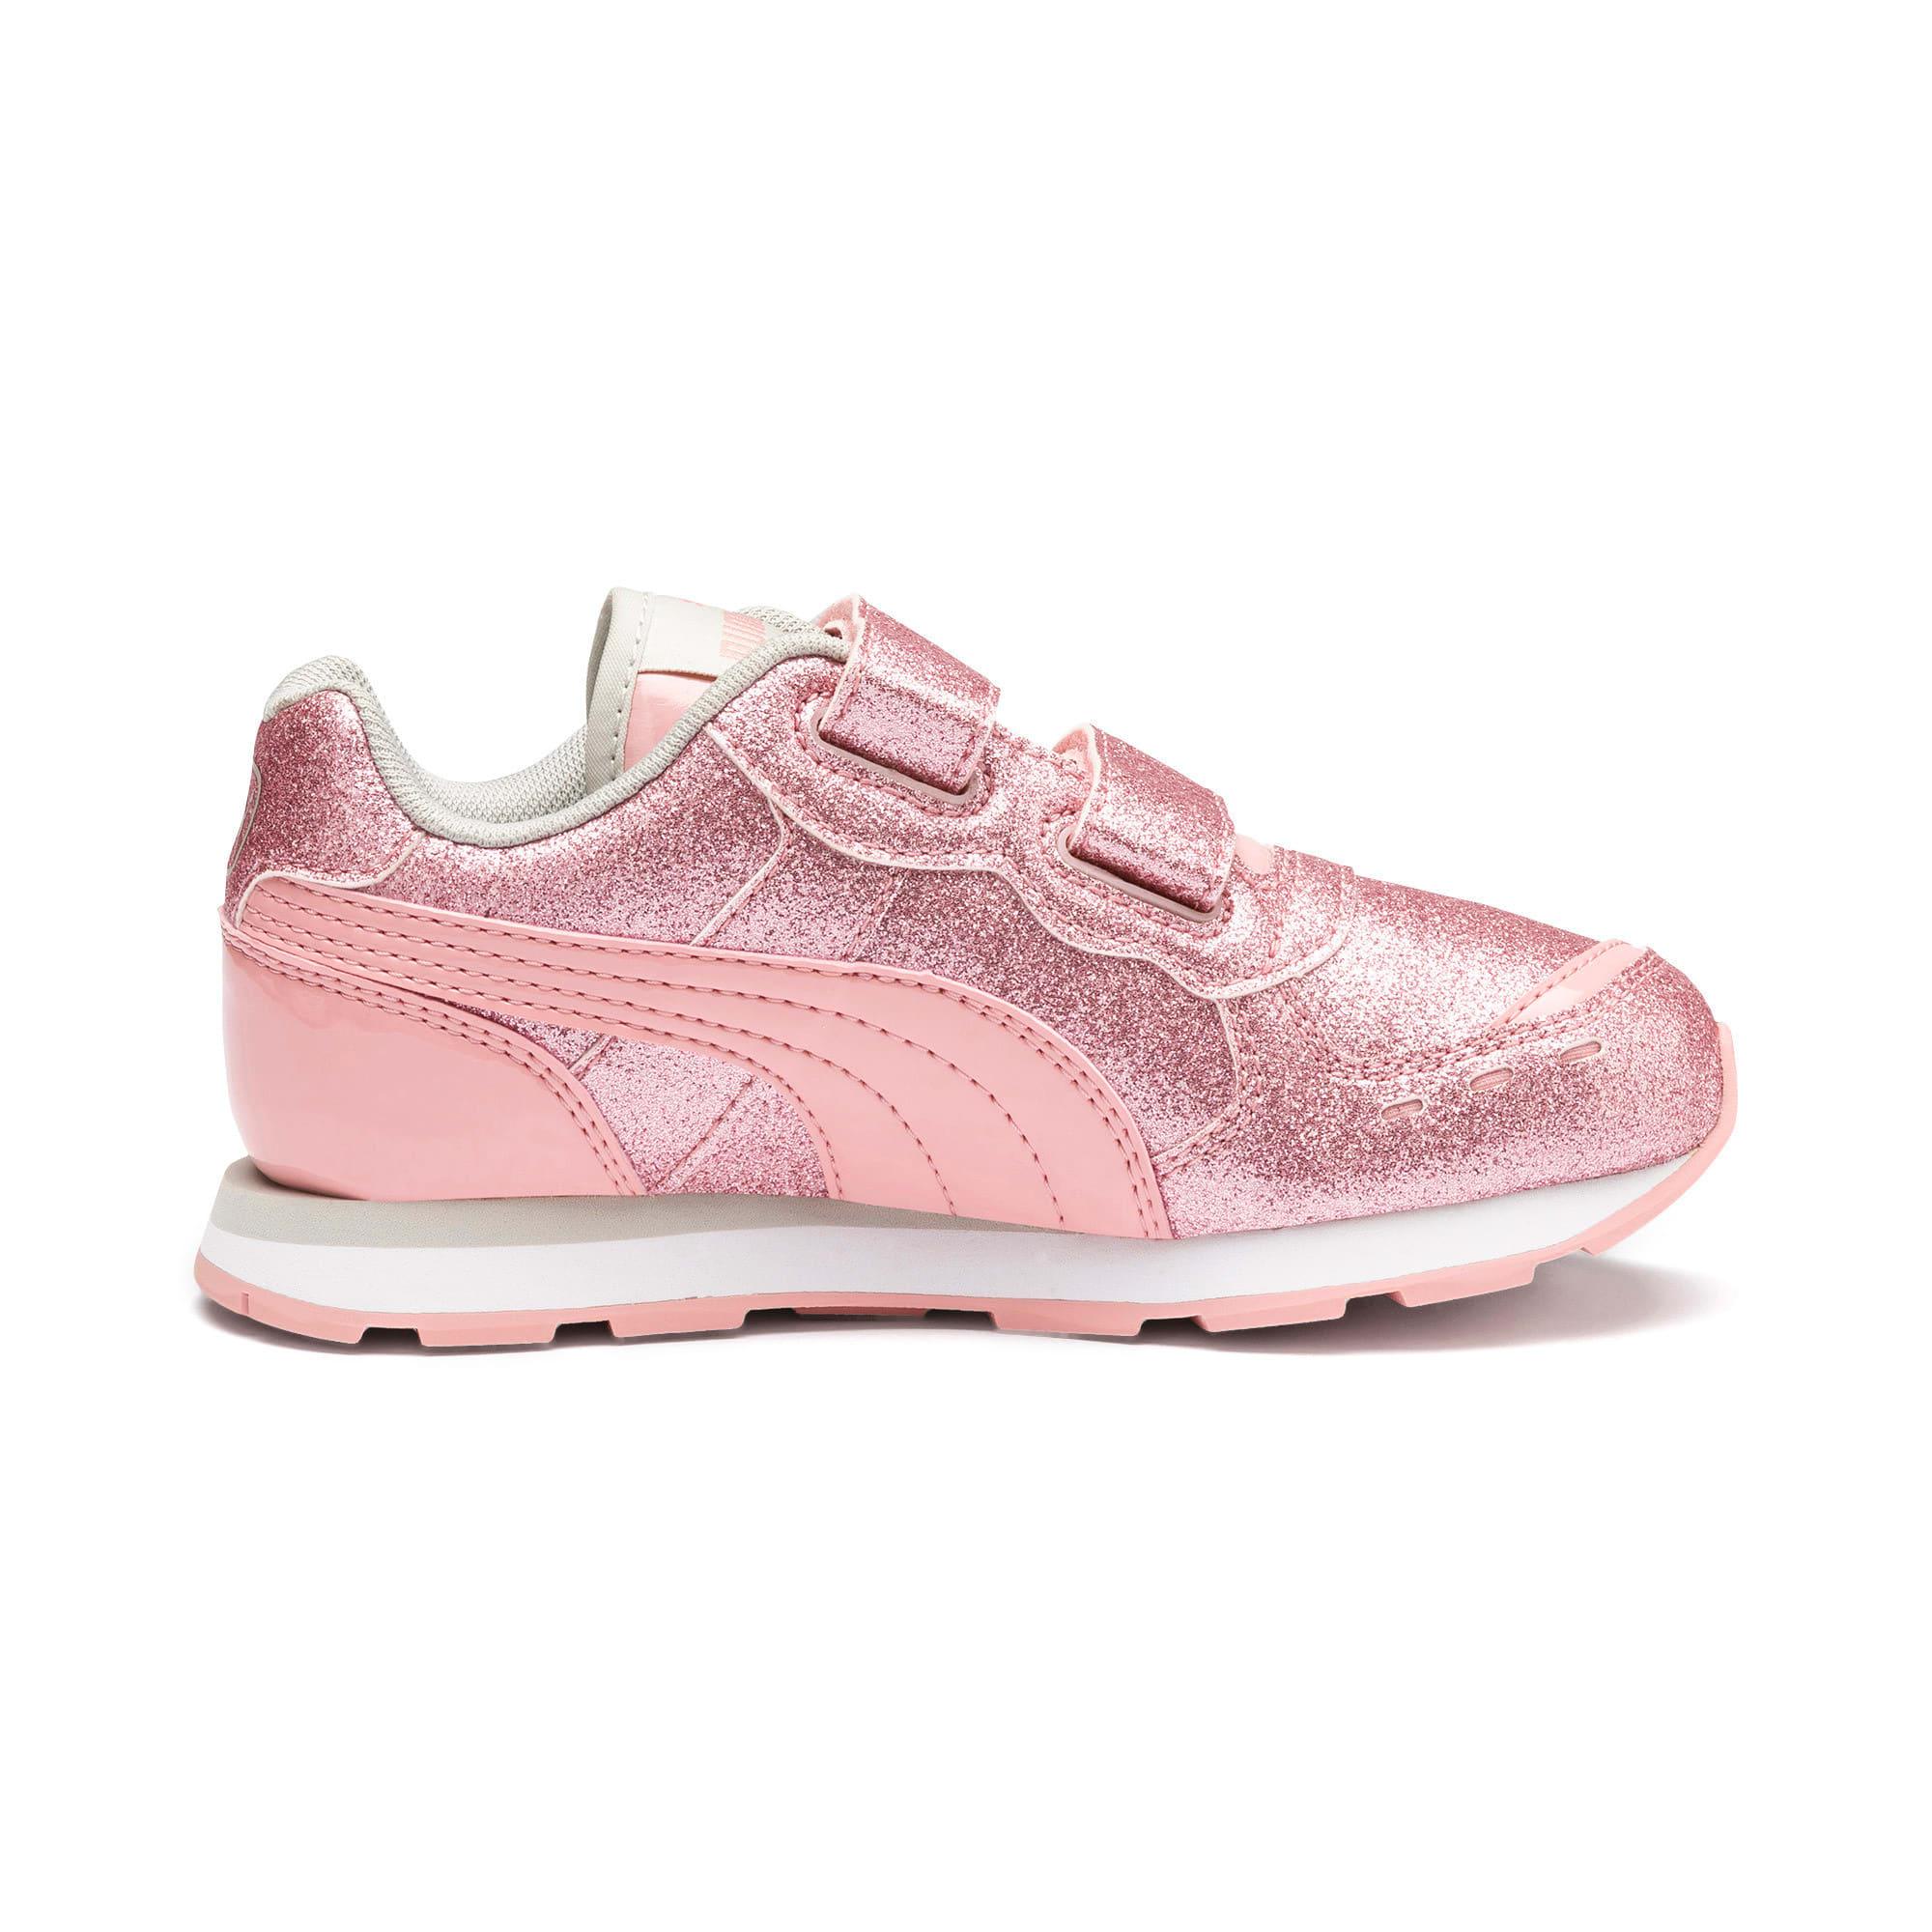 Miniatura 5 de Zapatos Vista Glitz para niña pequeña, Bridal Rose-Gray Violet, mediano